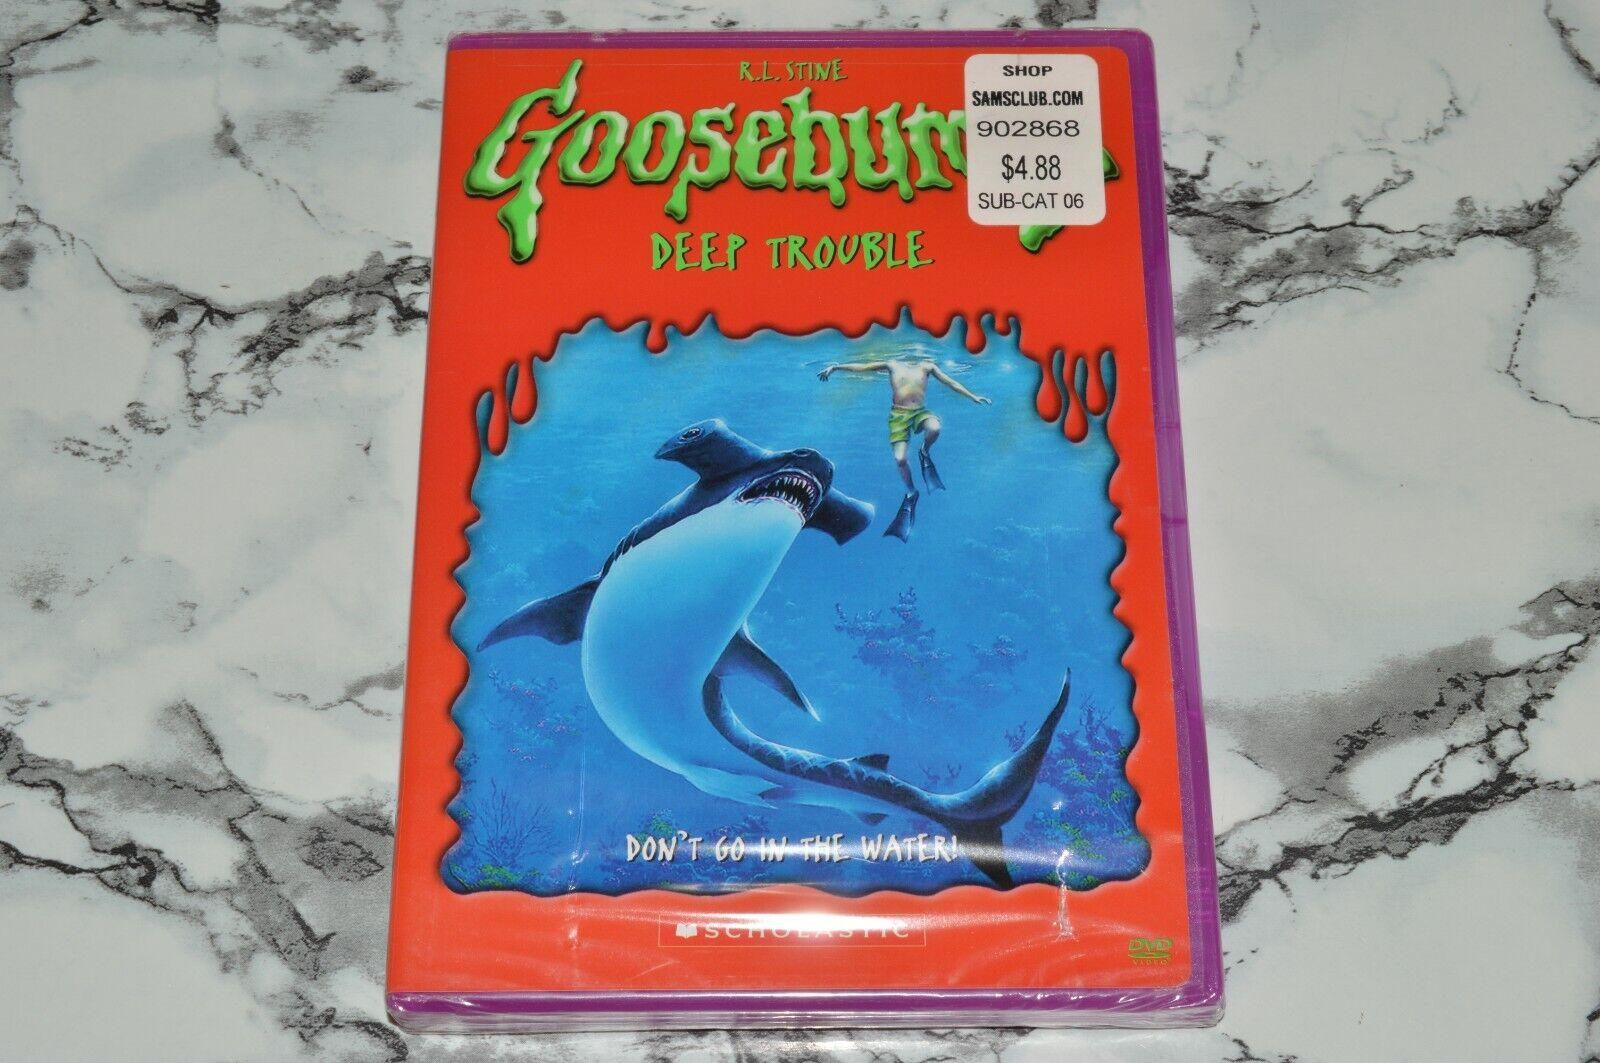 NEW - Goosebumps - Deep Trouble DVD, 2005 -- R.L. Stine Scholastic - $12.68